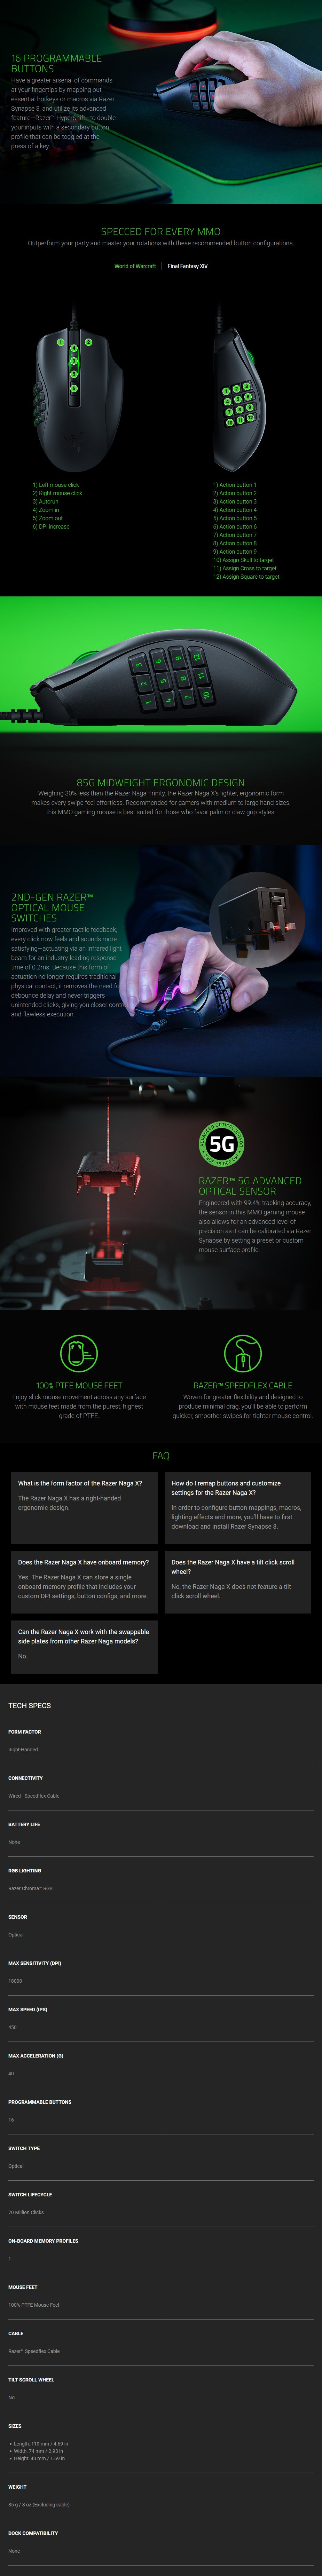 Razer Naga X MMO Optical Gaming Mouse - Overview 1